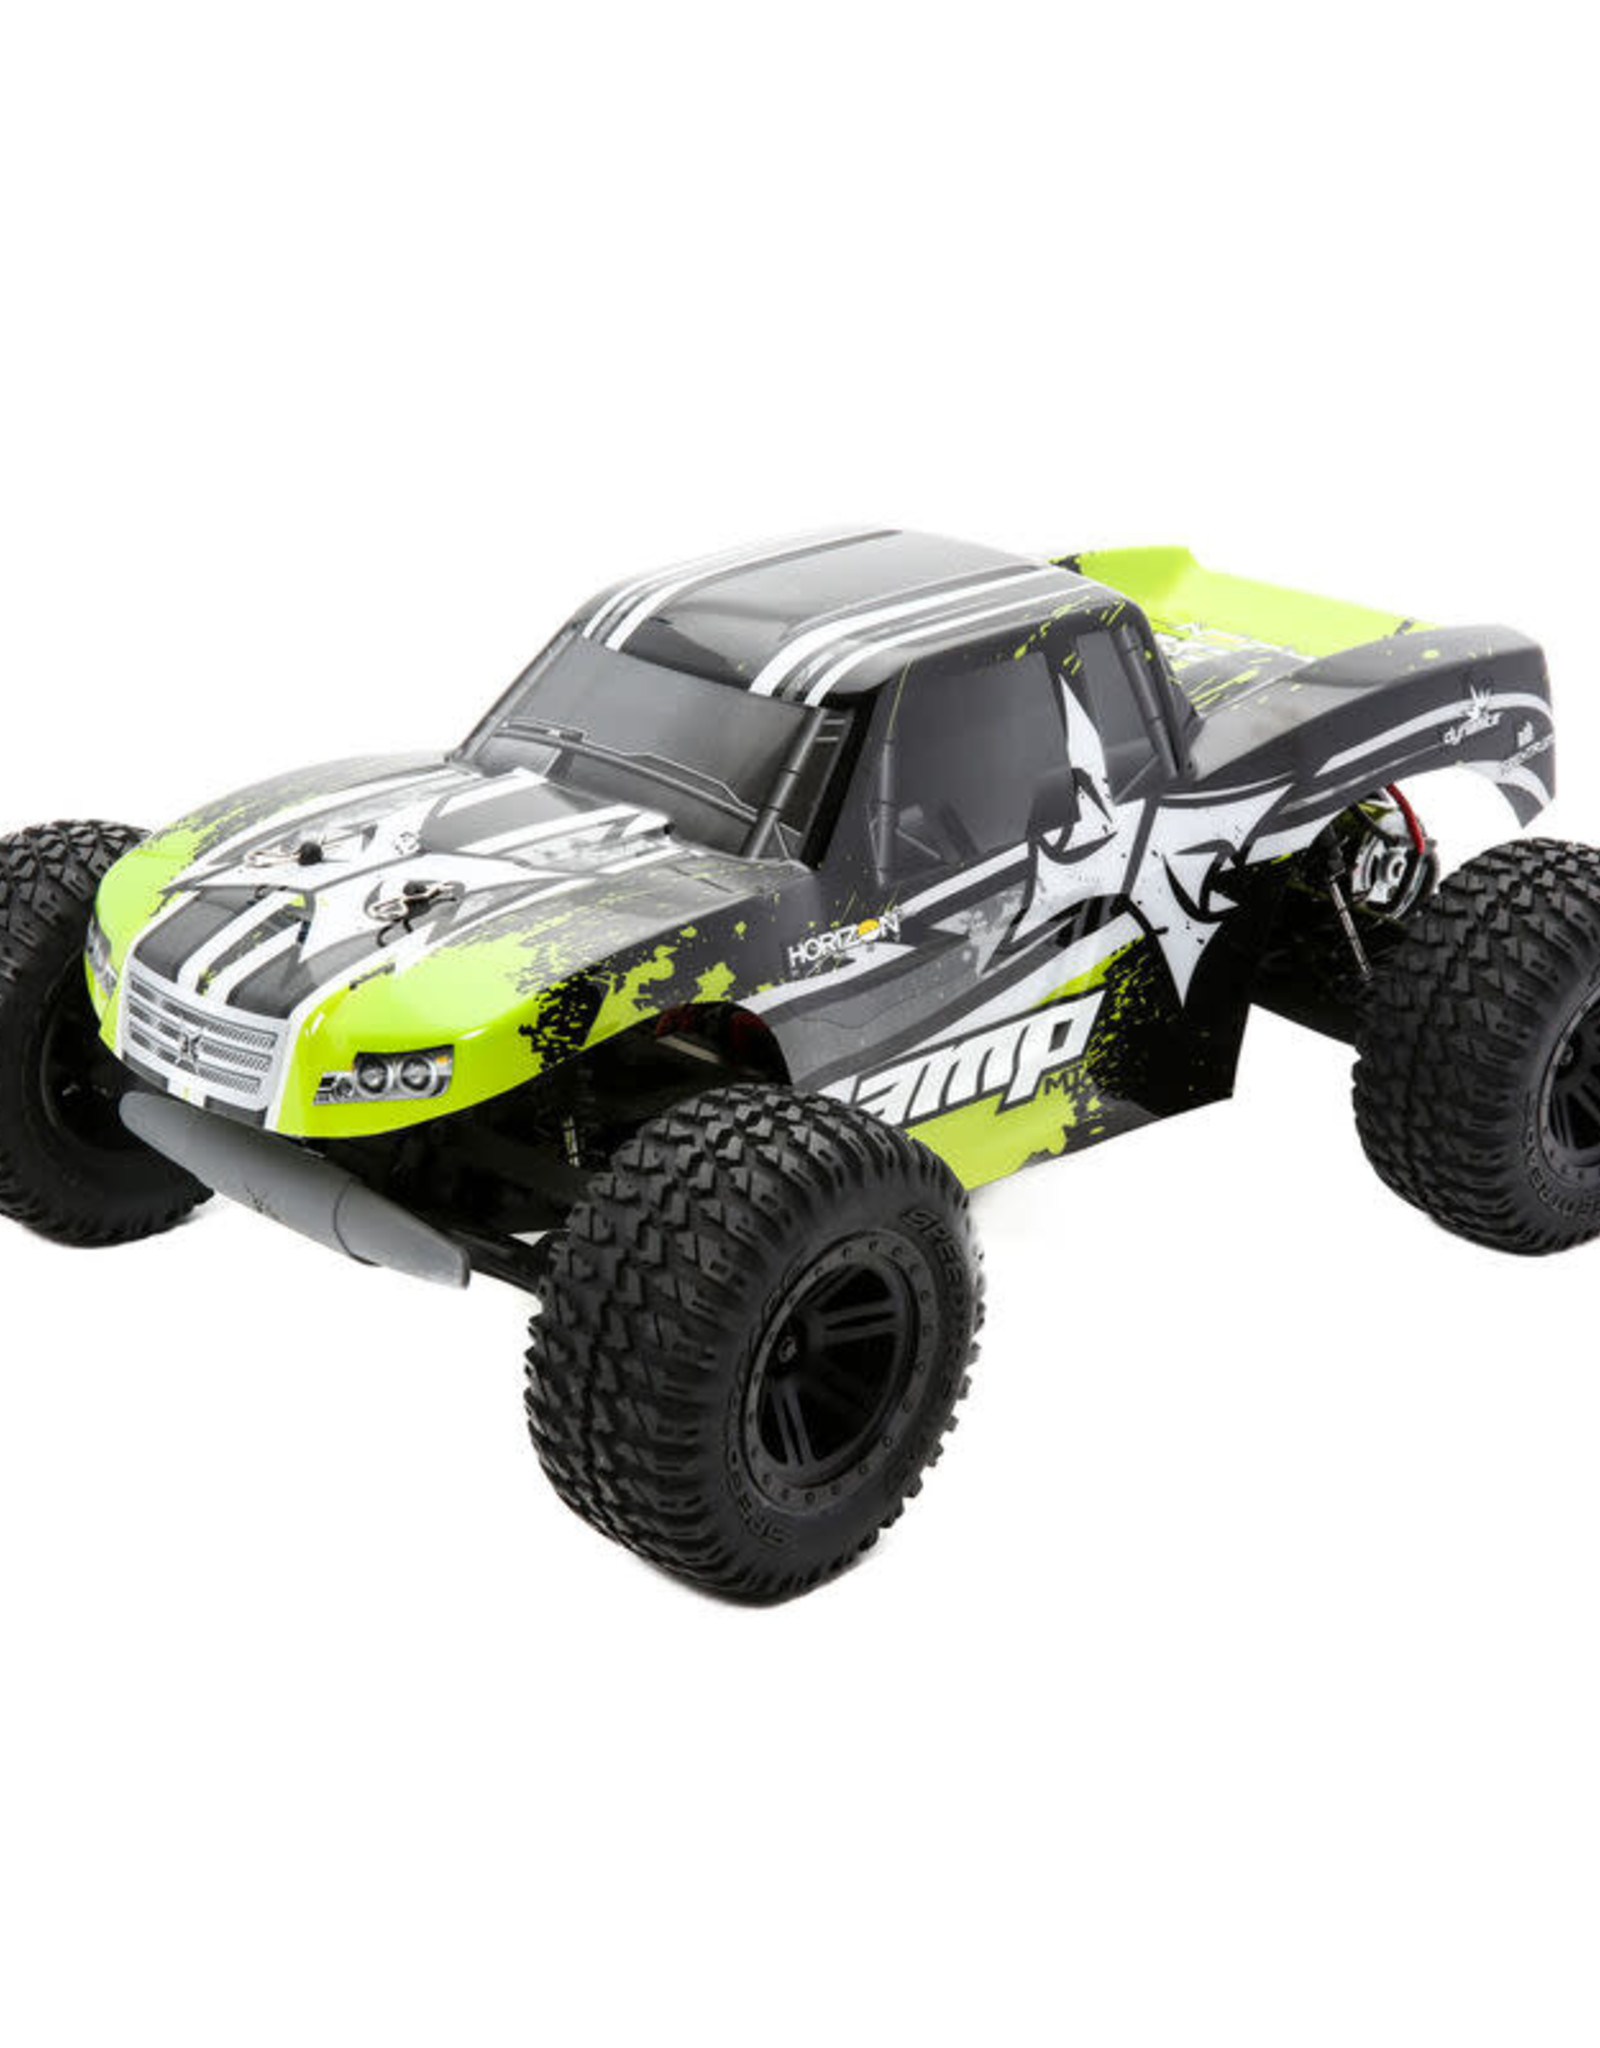 ECX ECX03028T2 AMP MT 1:10 2WD Monster Truck: Black/Green RTR